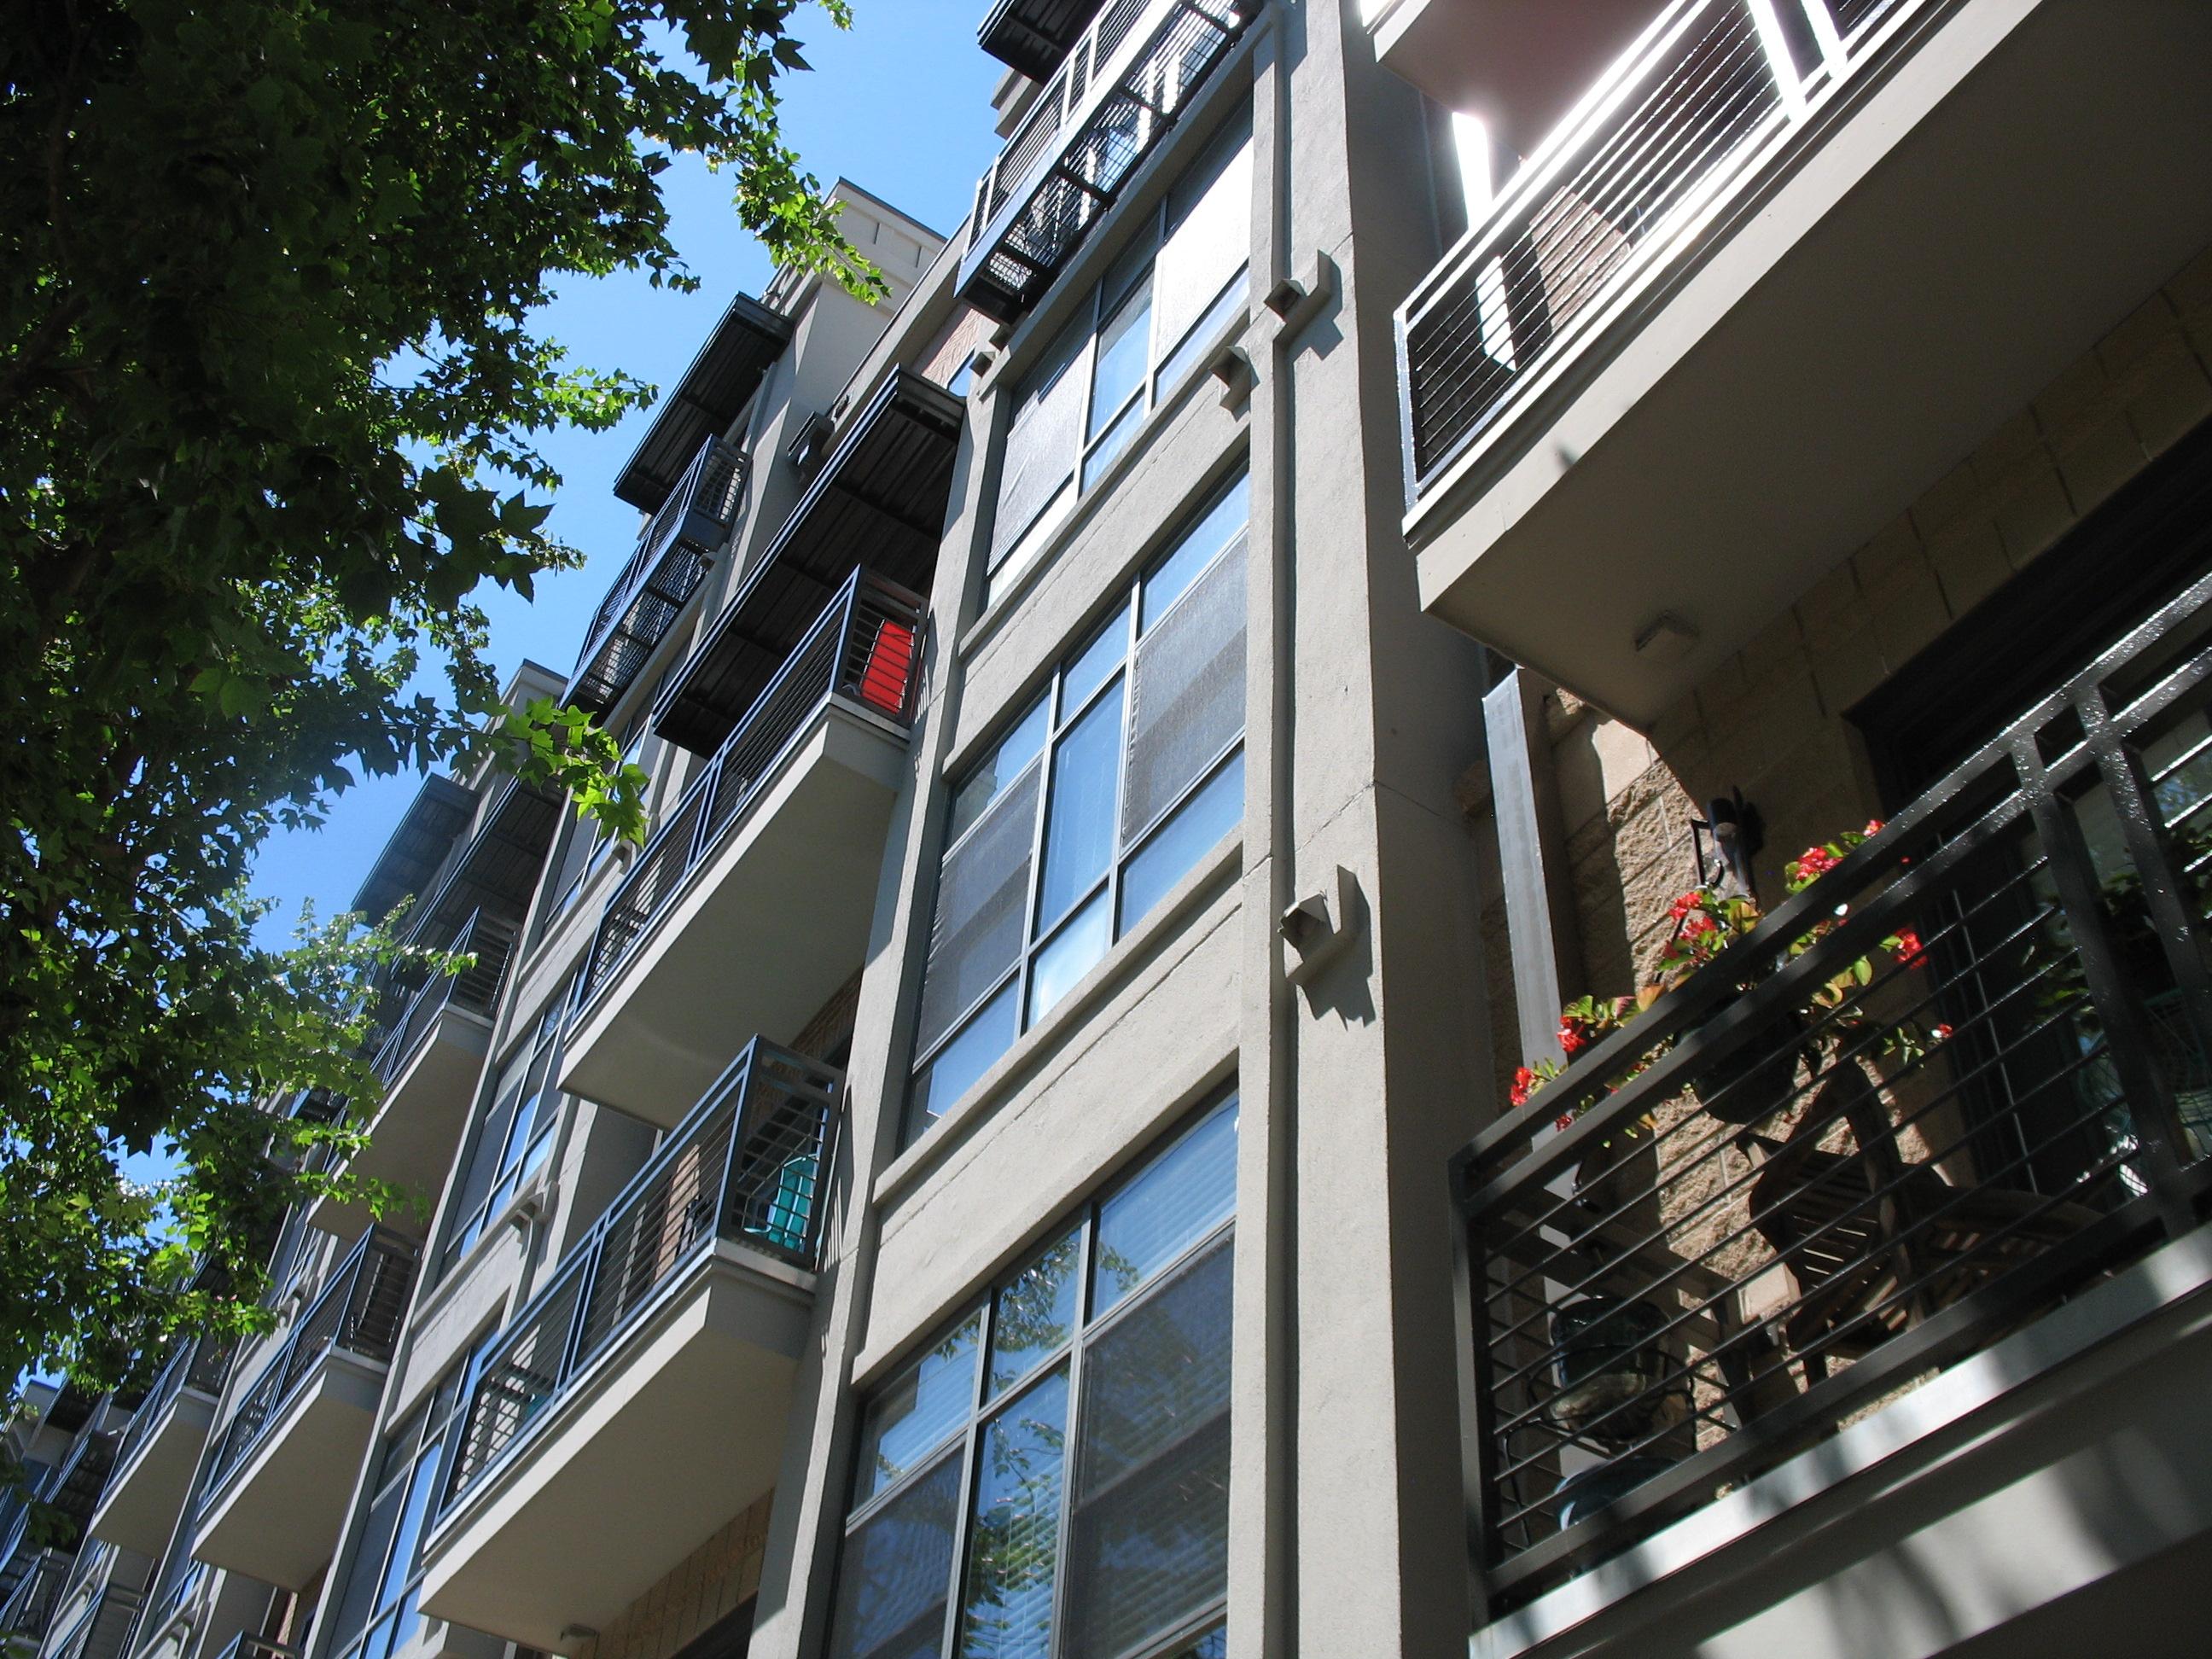 Apartment window screens and sliding screen doors